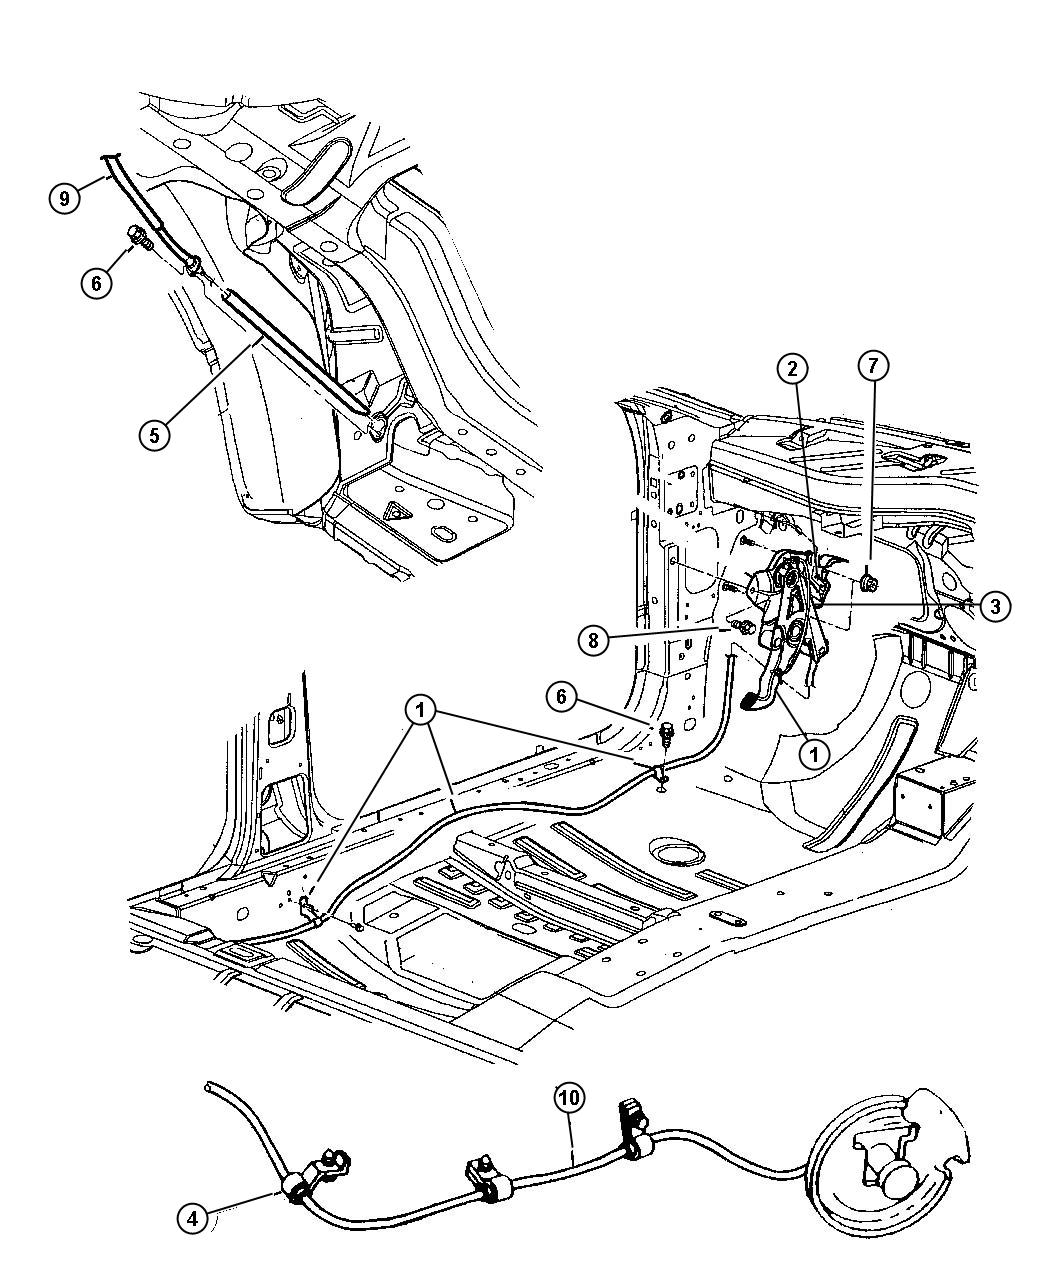 Dodge Nitro Sxt 4x2 3 7l V6 6 Speed Manual Nsg370 Lever